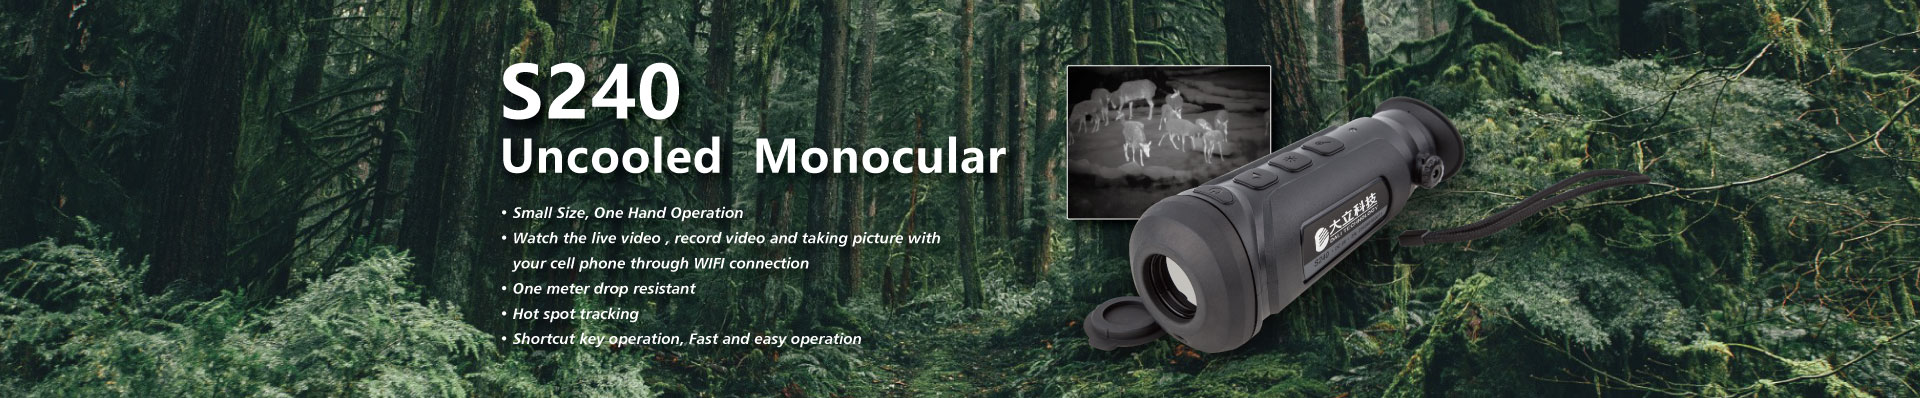 S240 Uncooled Monocular